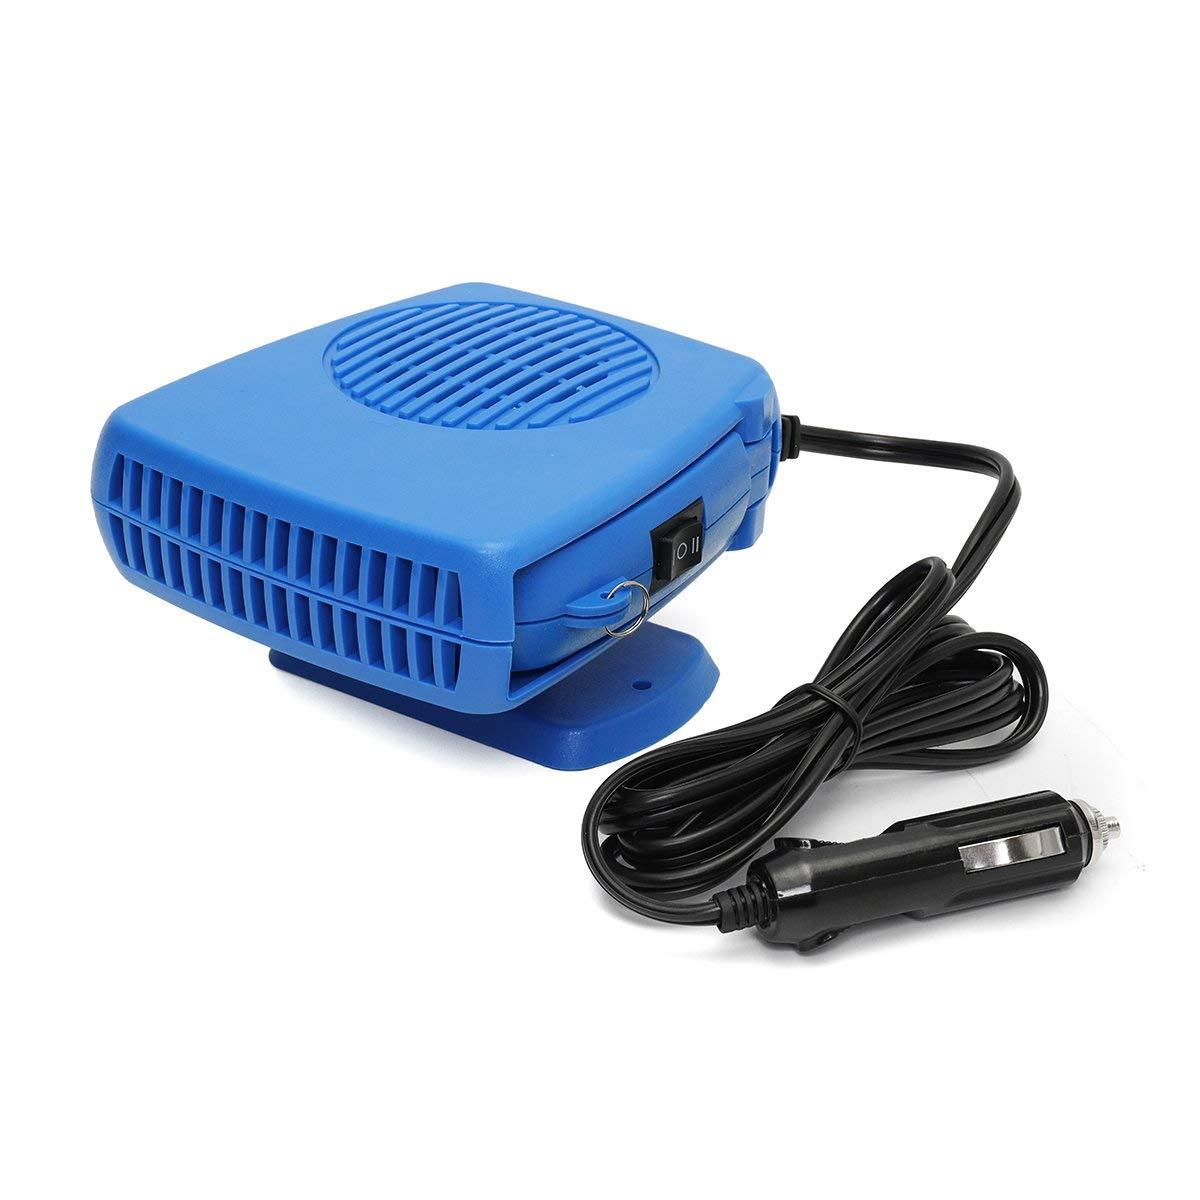 12V 500W Car Heater Cooler Fan Defogger Demister Quickly Heat